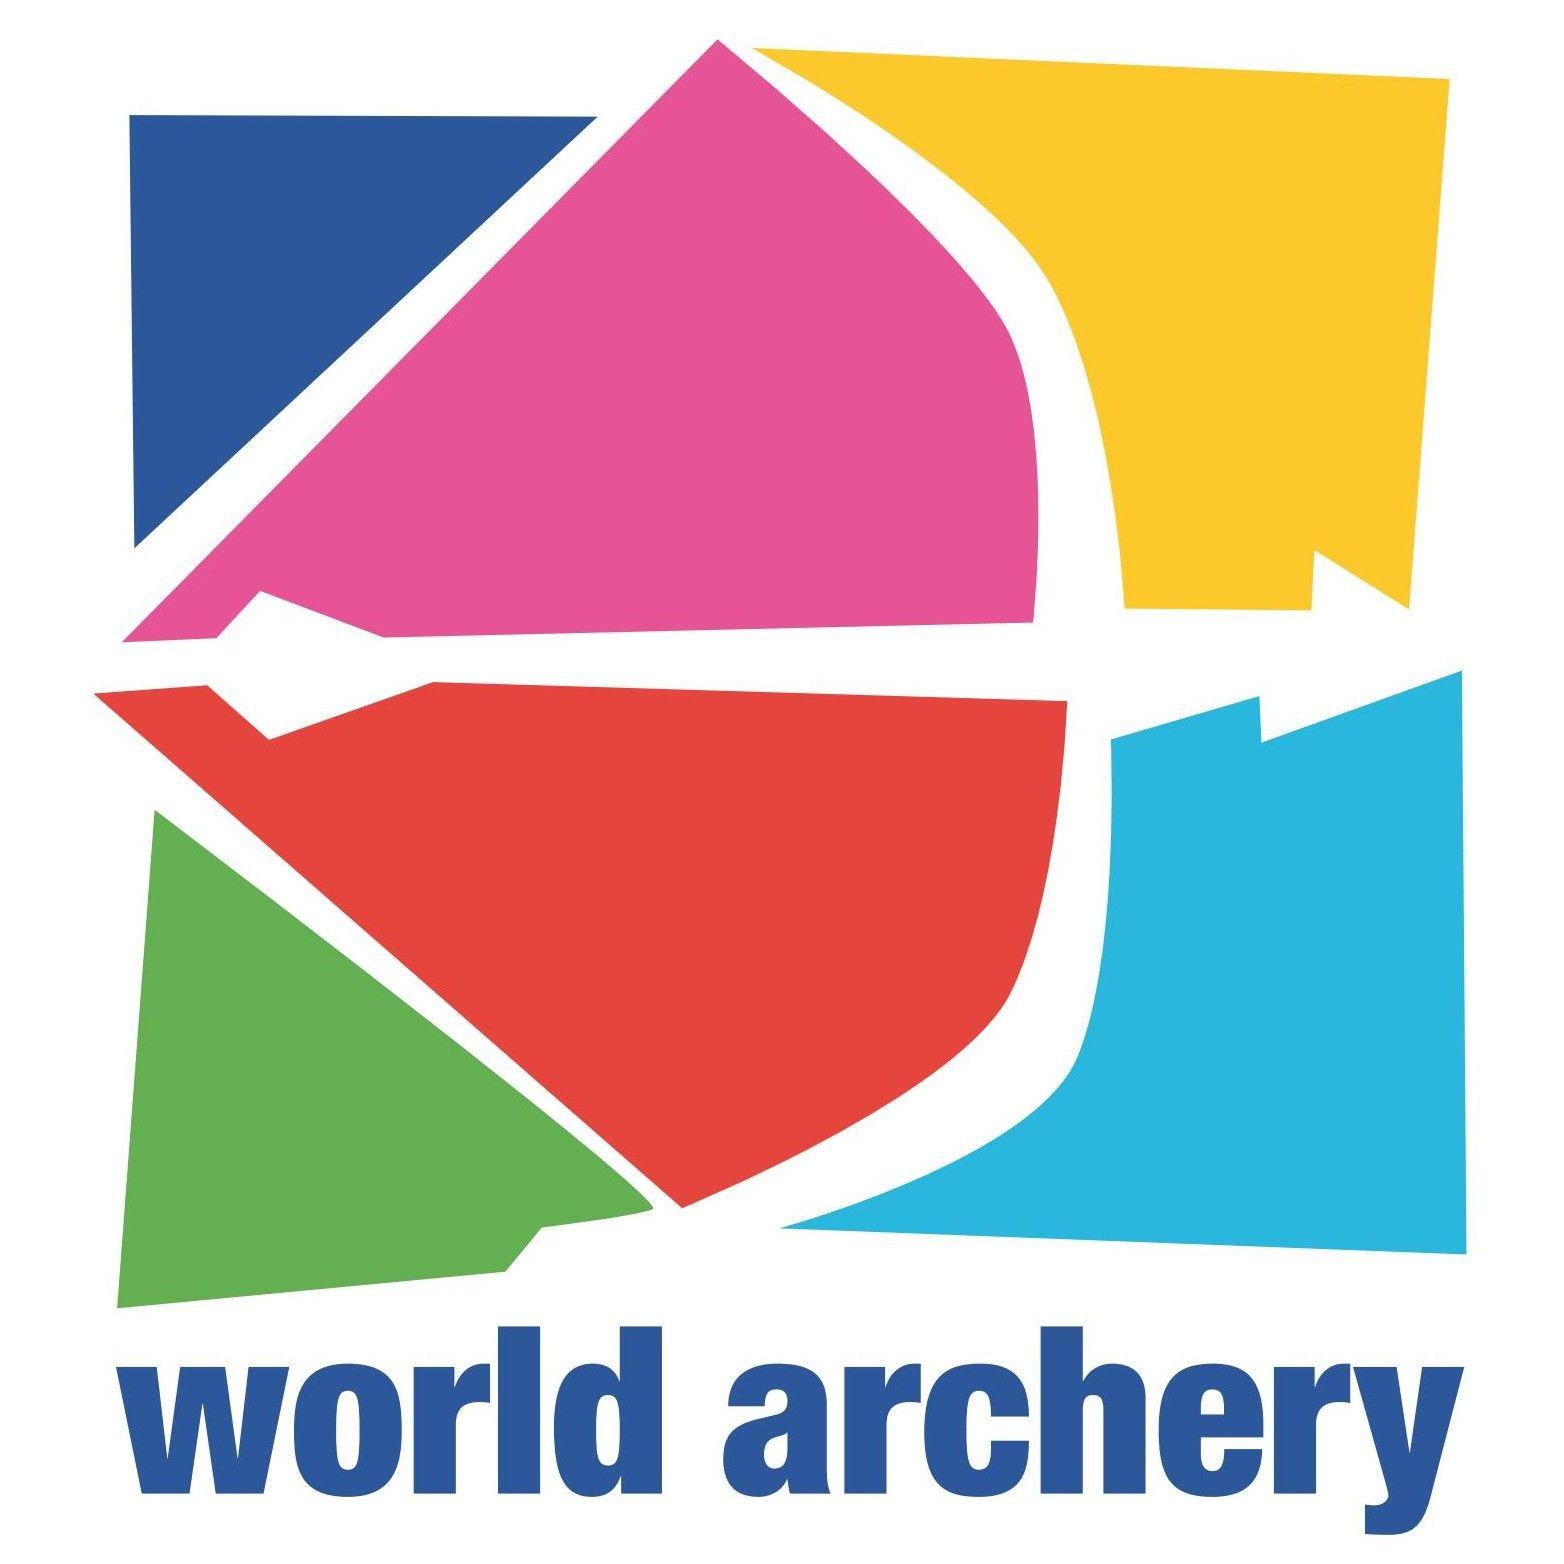 World Archery Federation Wa Logo Eps File Vector Eps Free Download Logo Icons Brand Emblems Archery Archery Shop Archery Logo